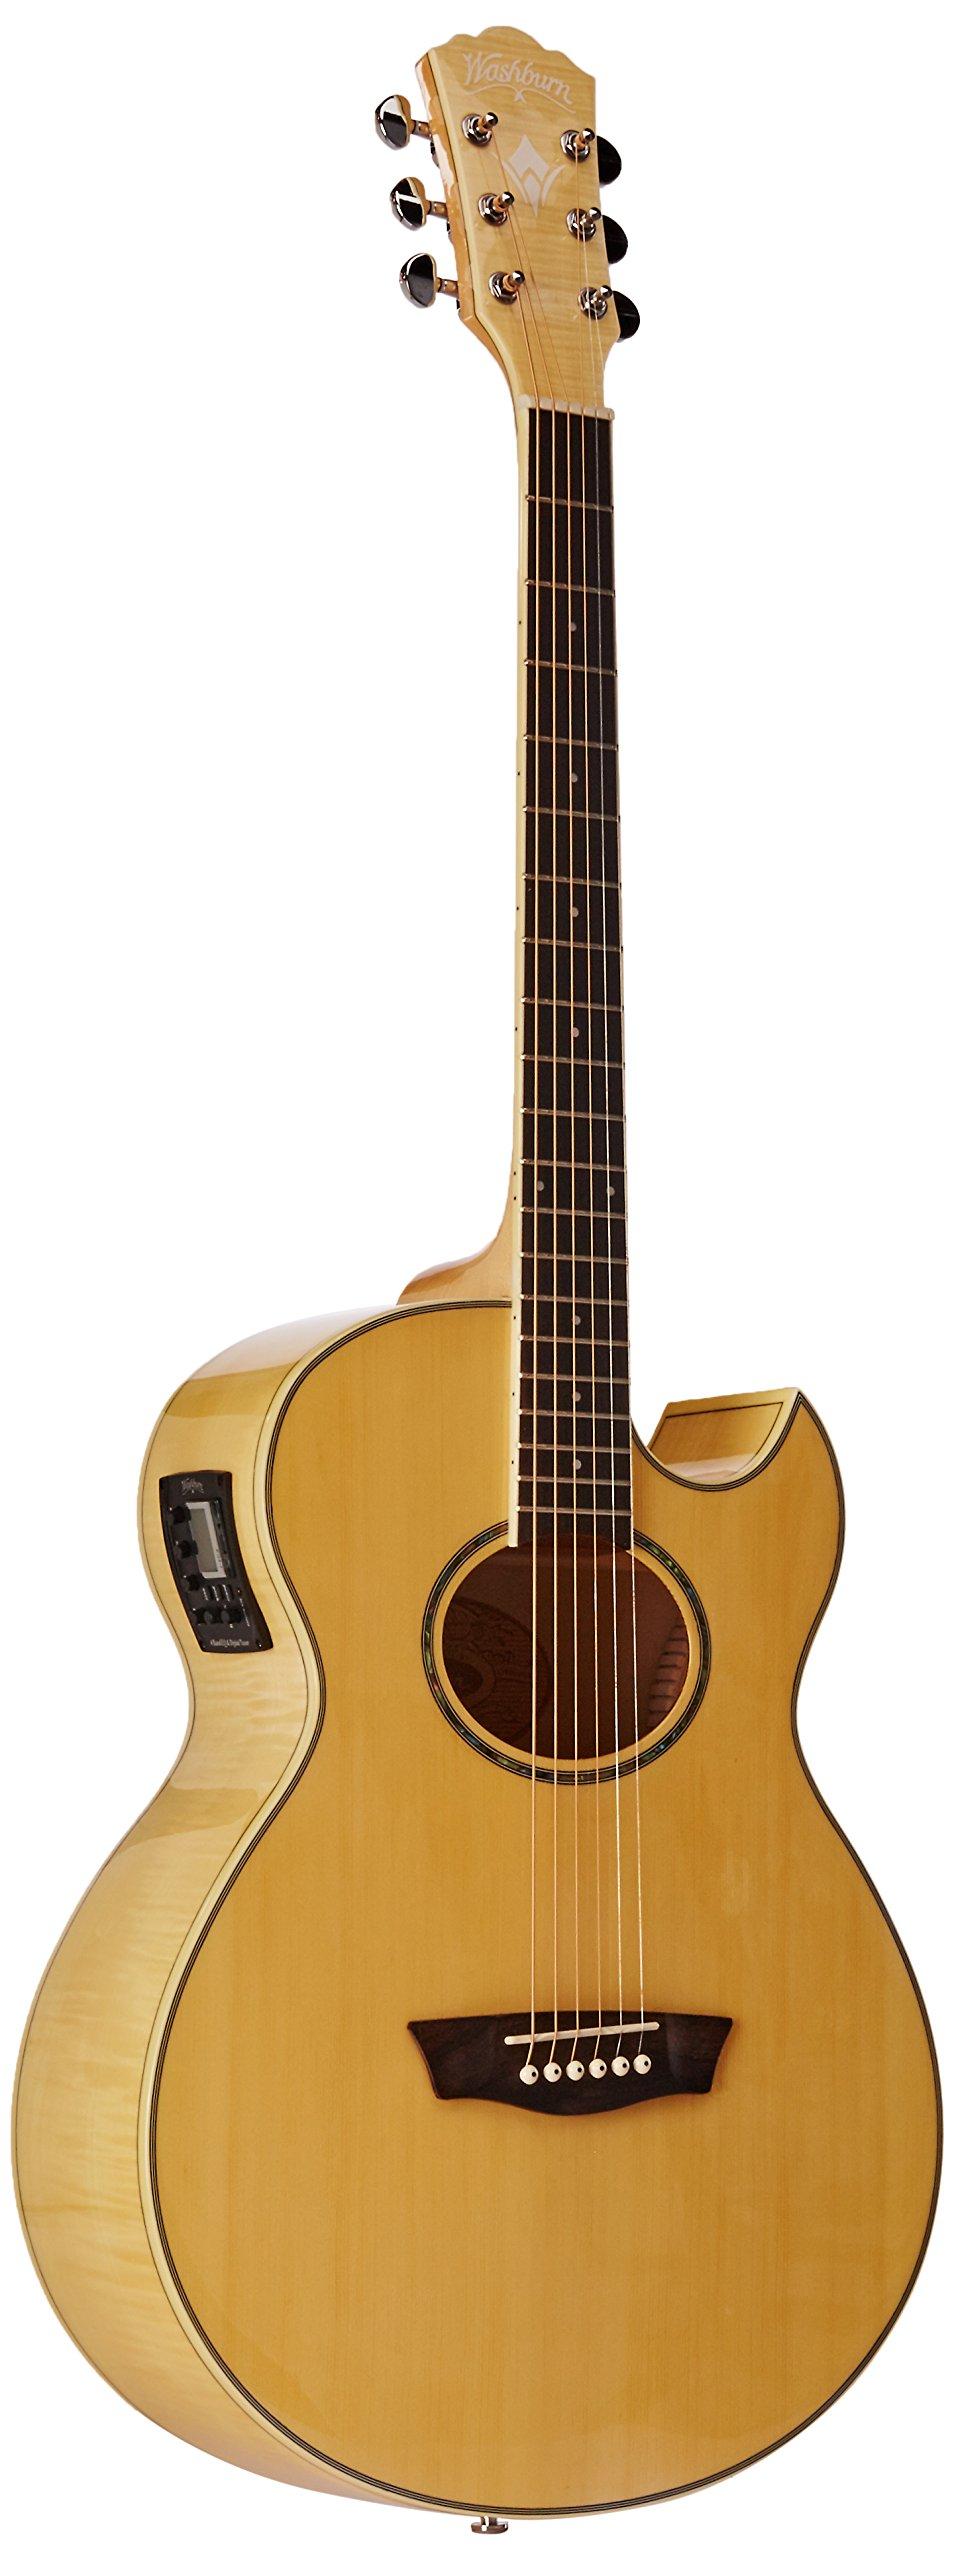 Wahsburn Festival Series EA20 Acoustic Guitar by Washburn